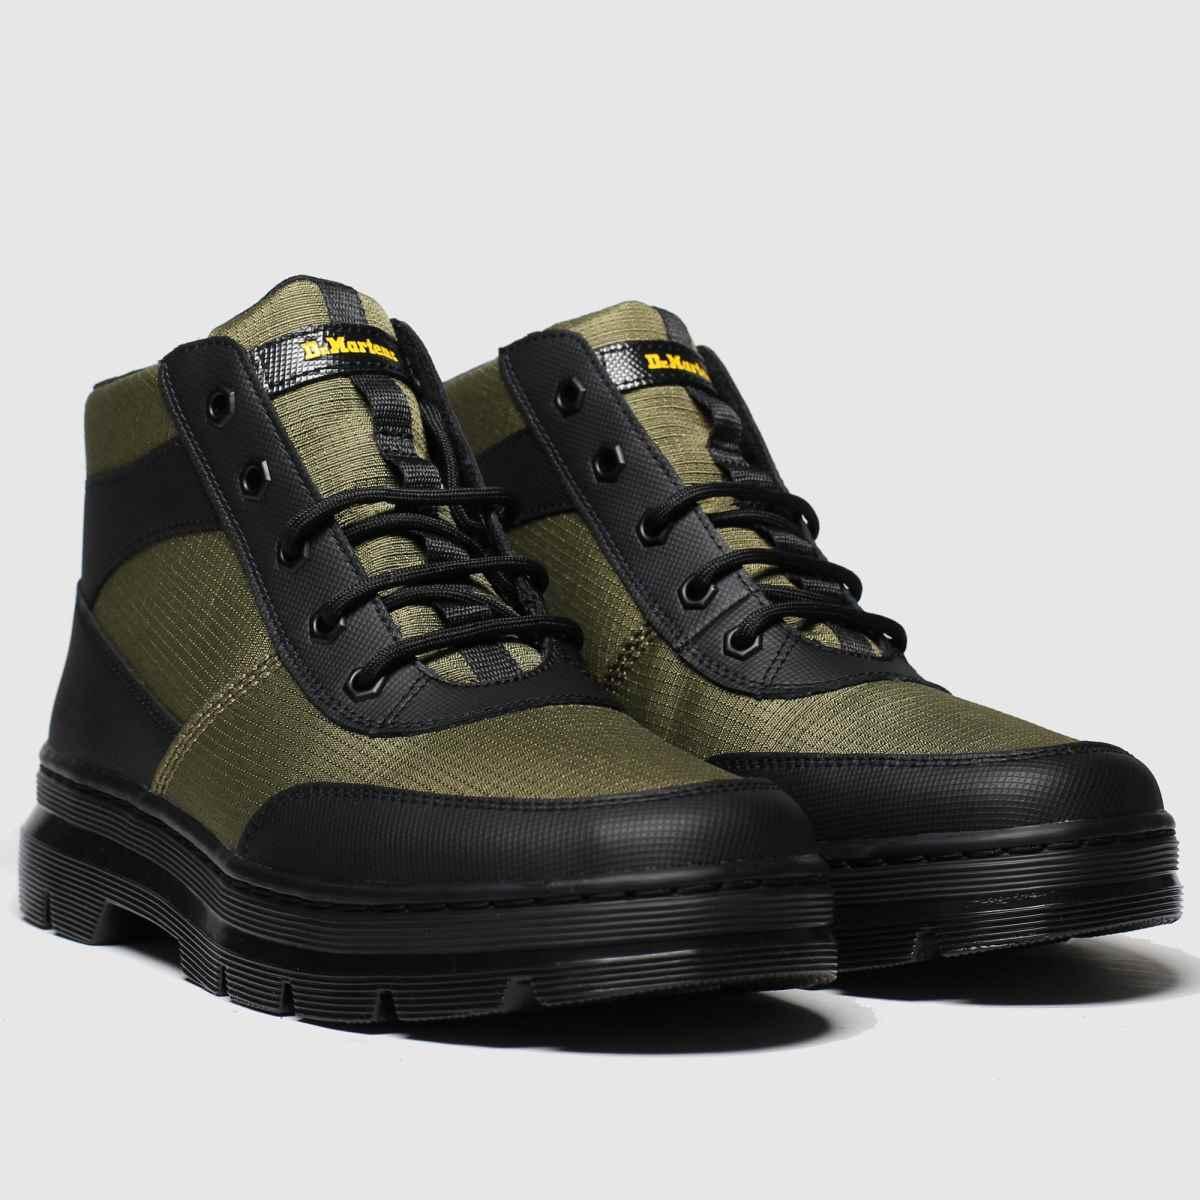 Dr Martens khaki bonny tech 6 eye boots (sizes 7 to 12 incl atop) - £44.99 @ Schuh